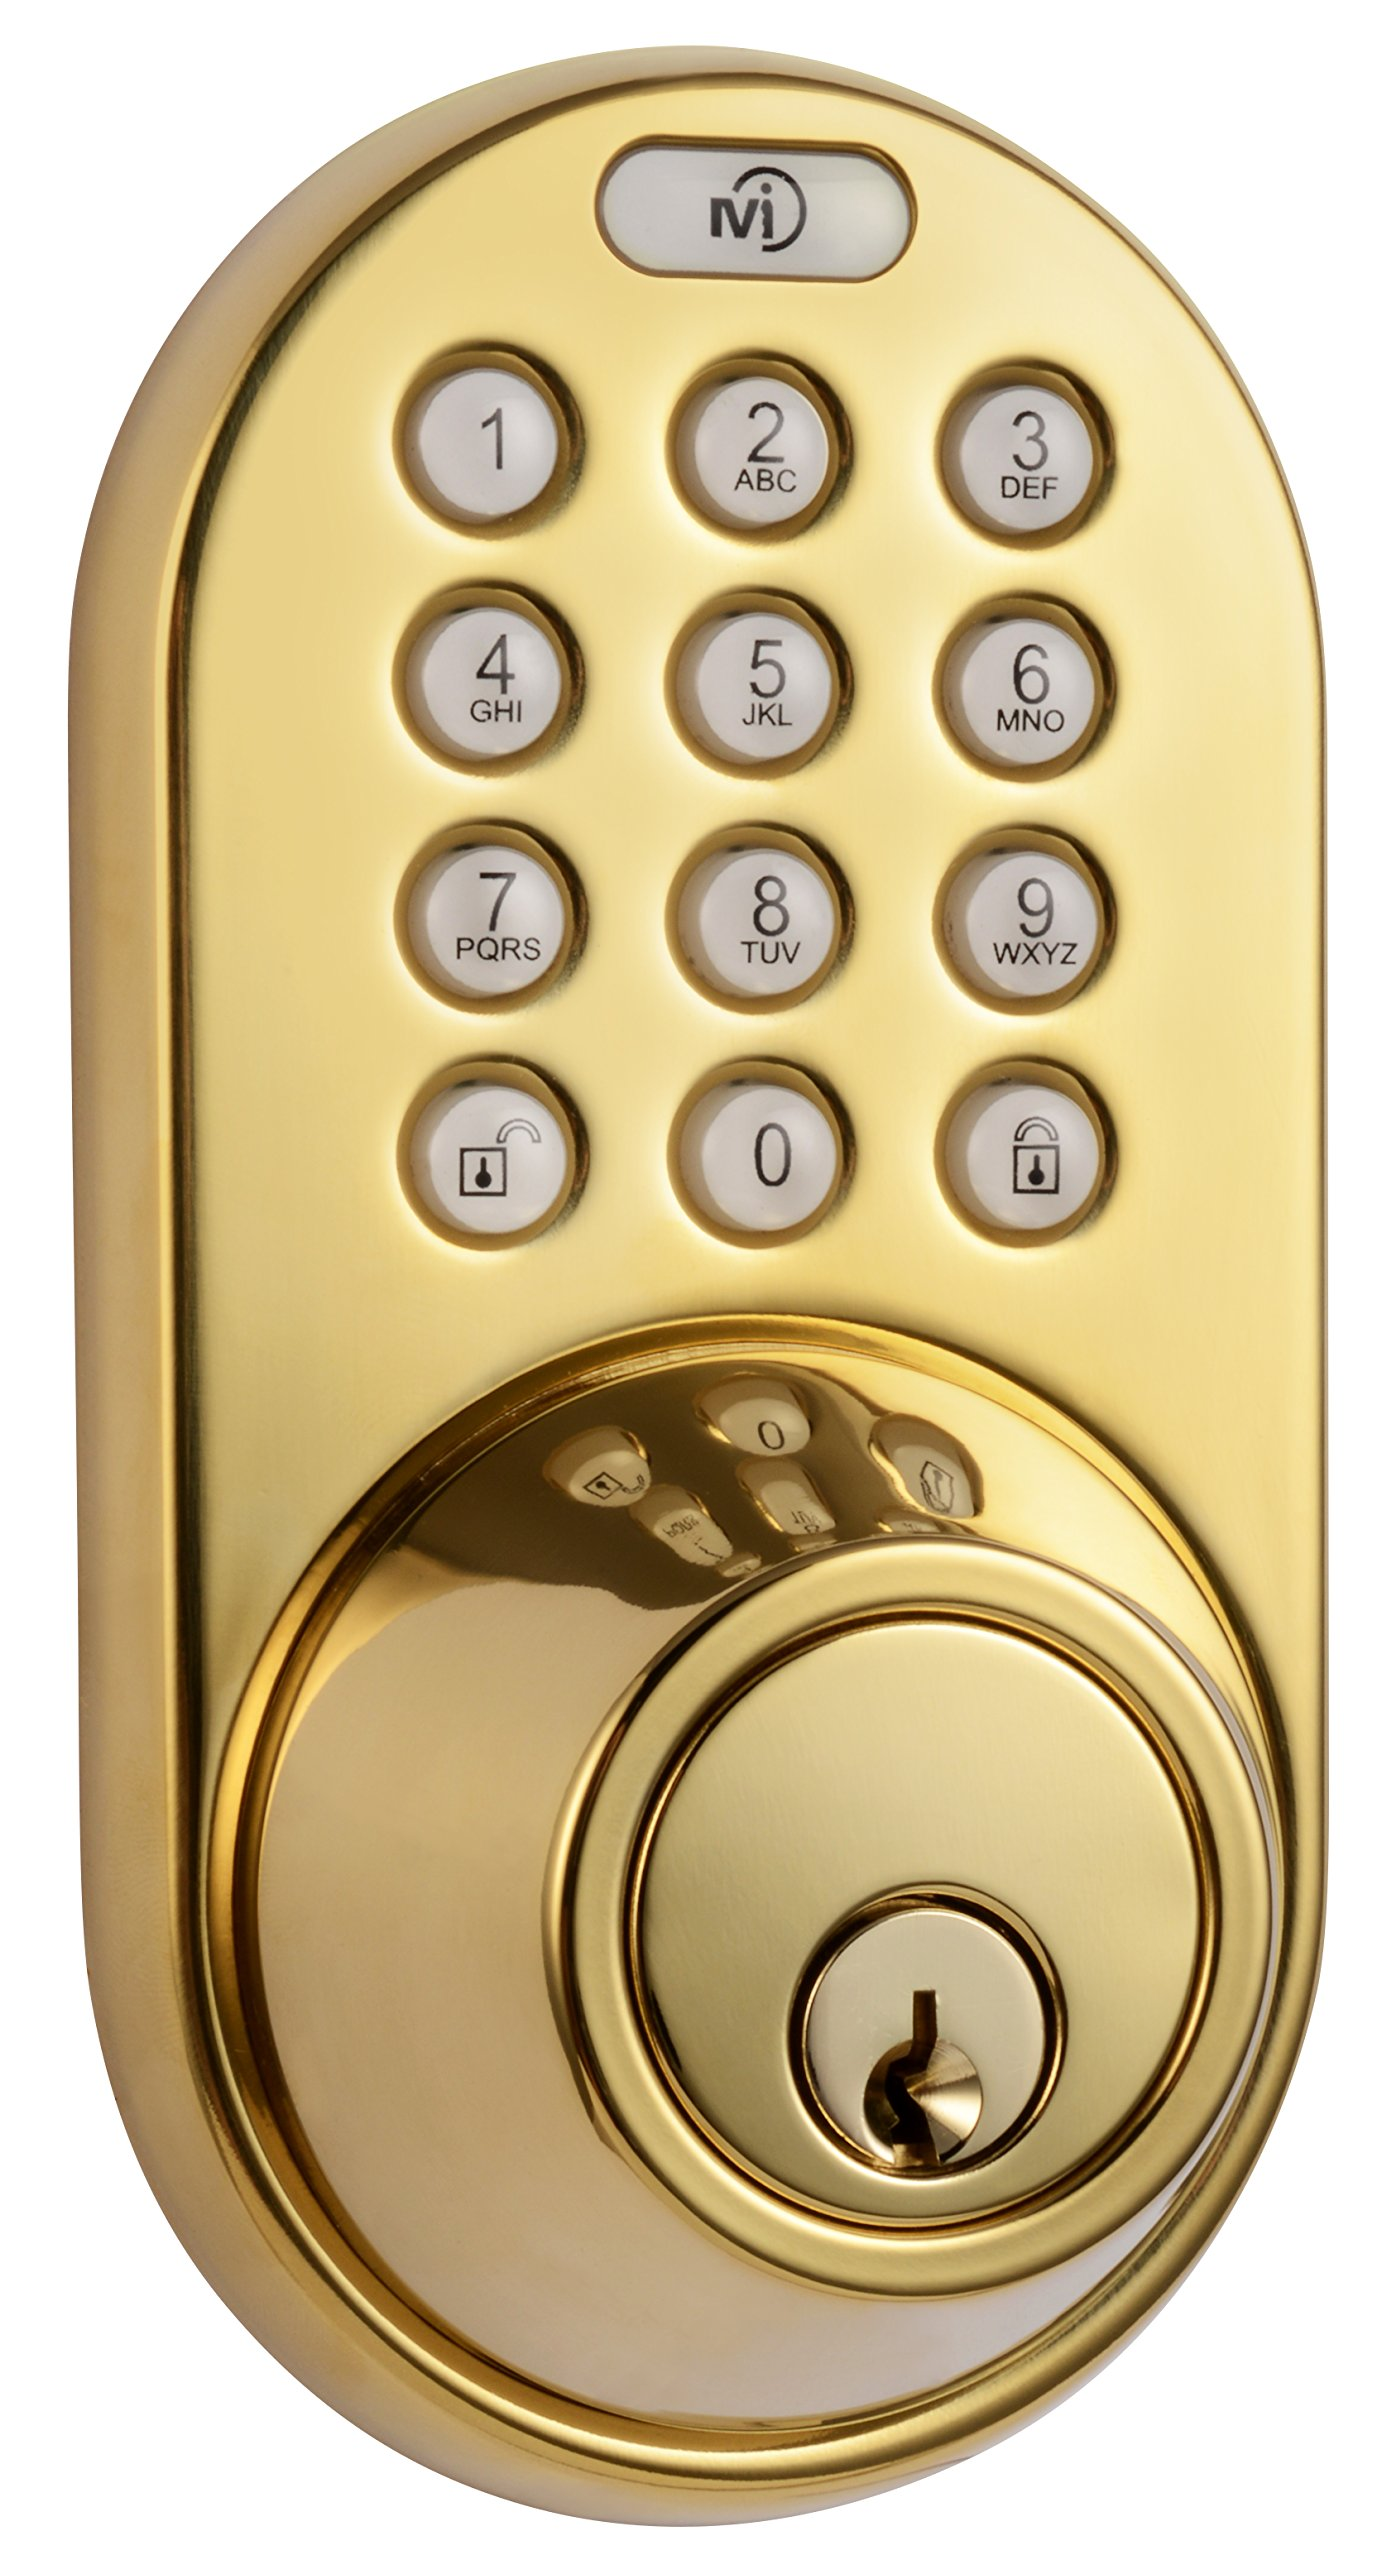 MiLocks DF-02P Keyless Entry Deadbolt Door Lock with Electronic Digital Keypad Entry, Polished Brass